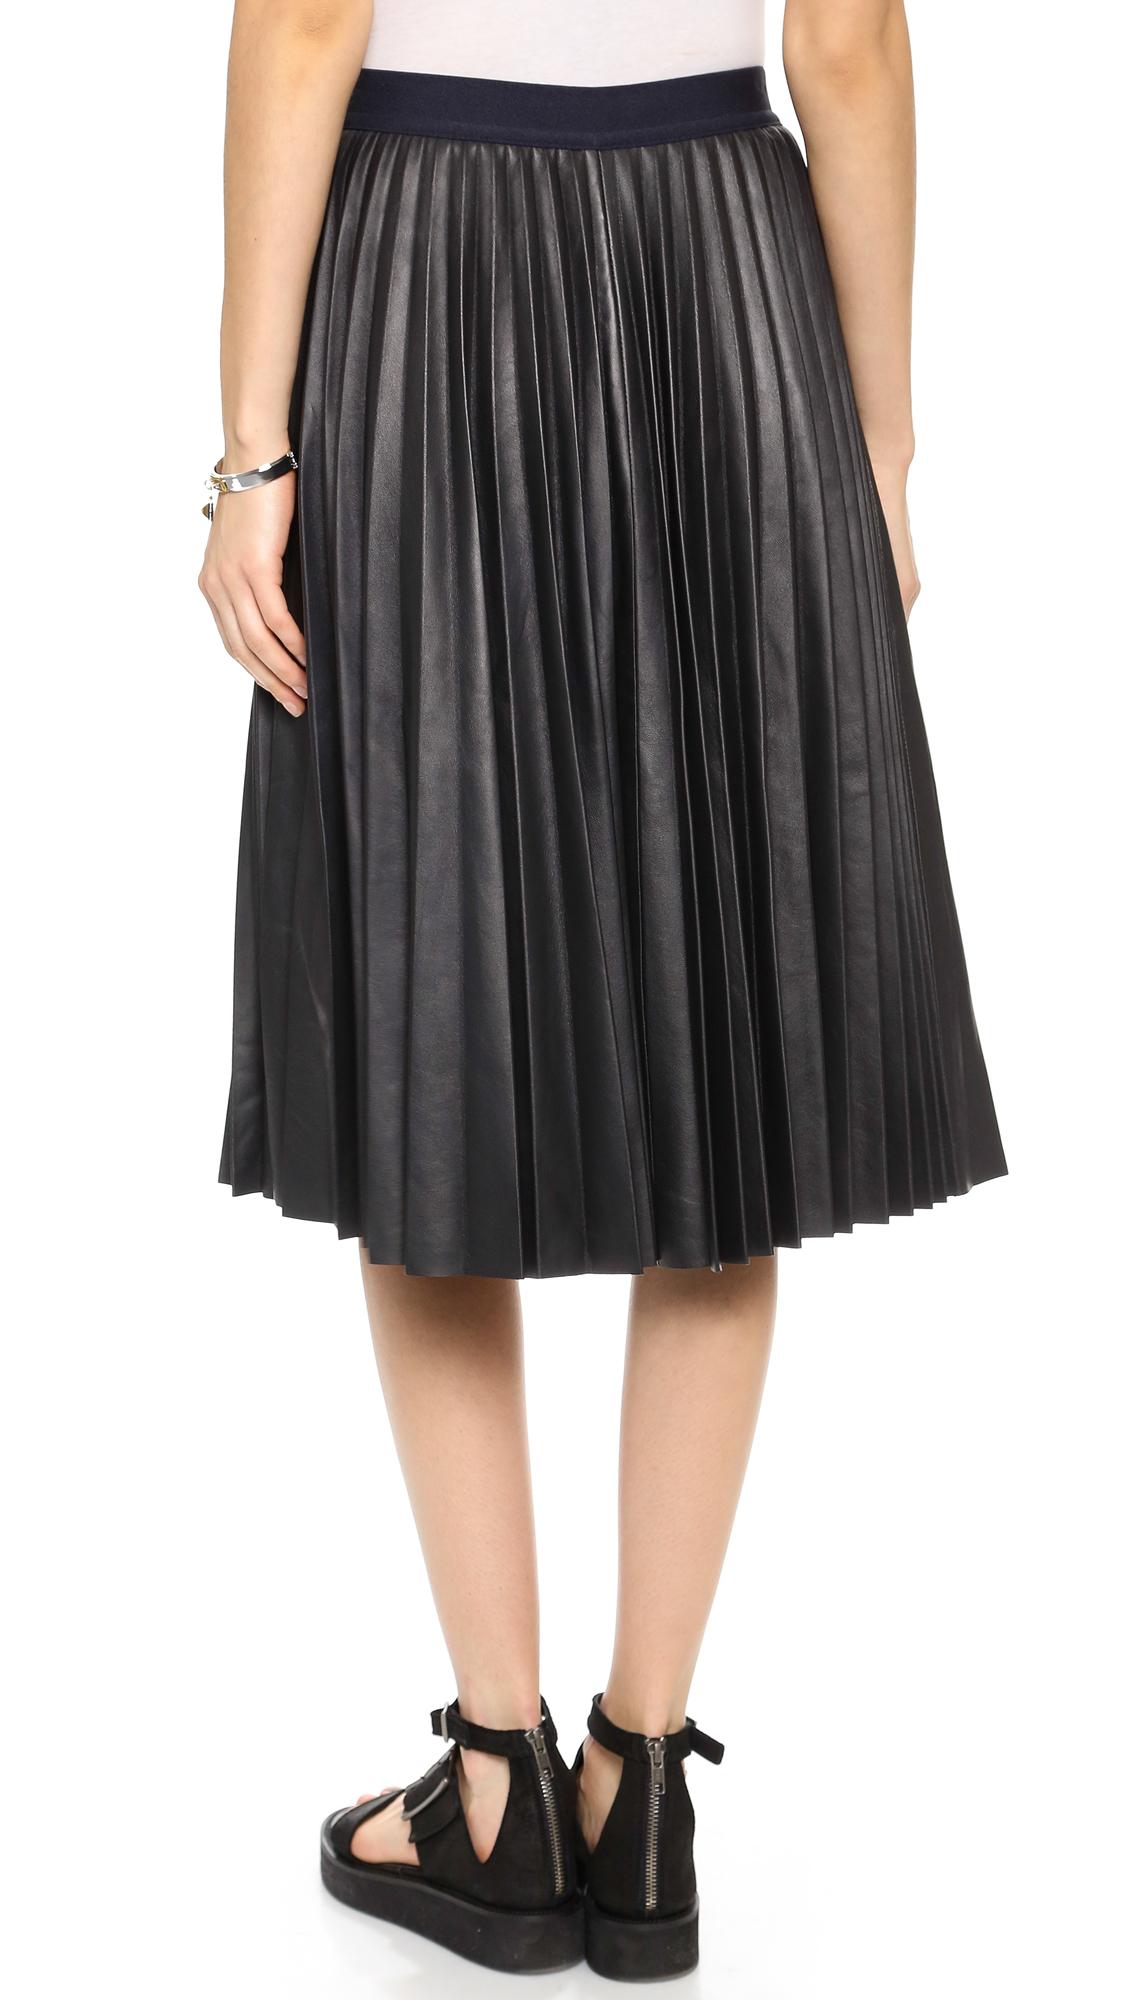 Navy Blue Leather Skirt